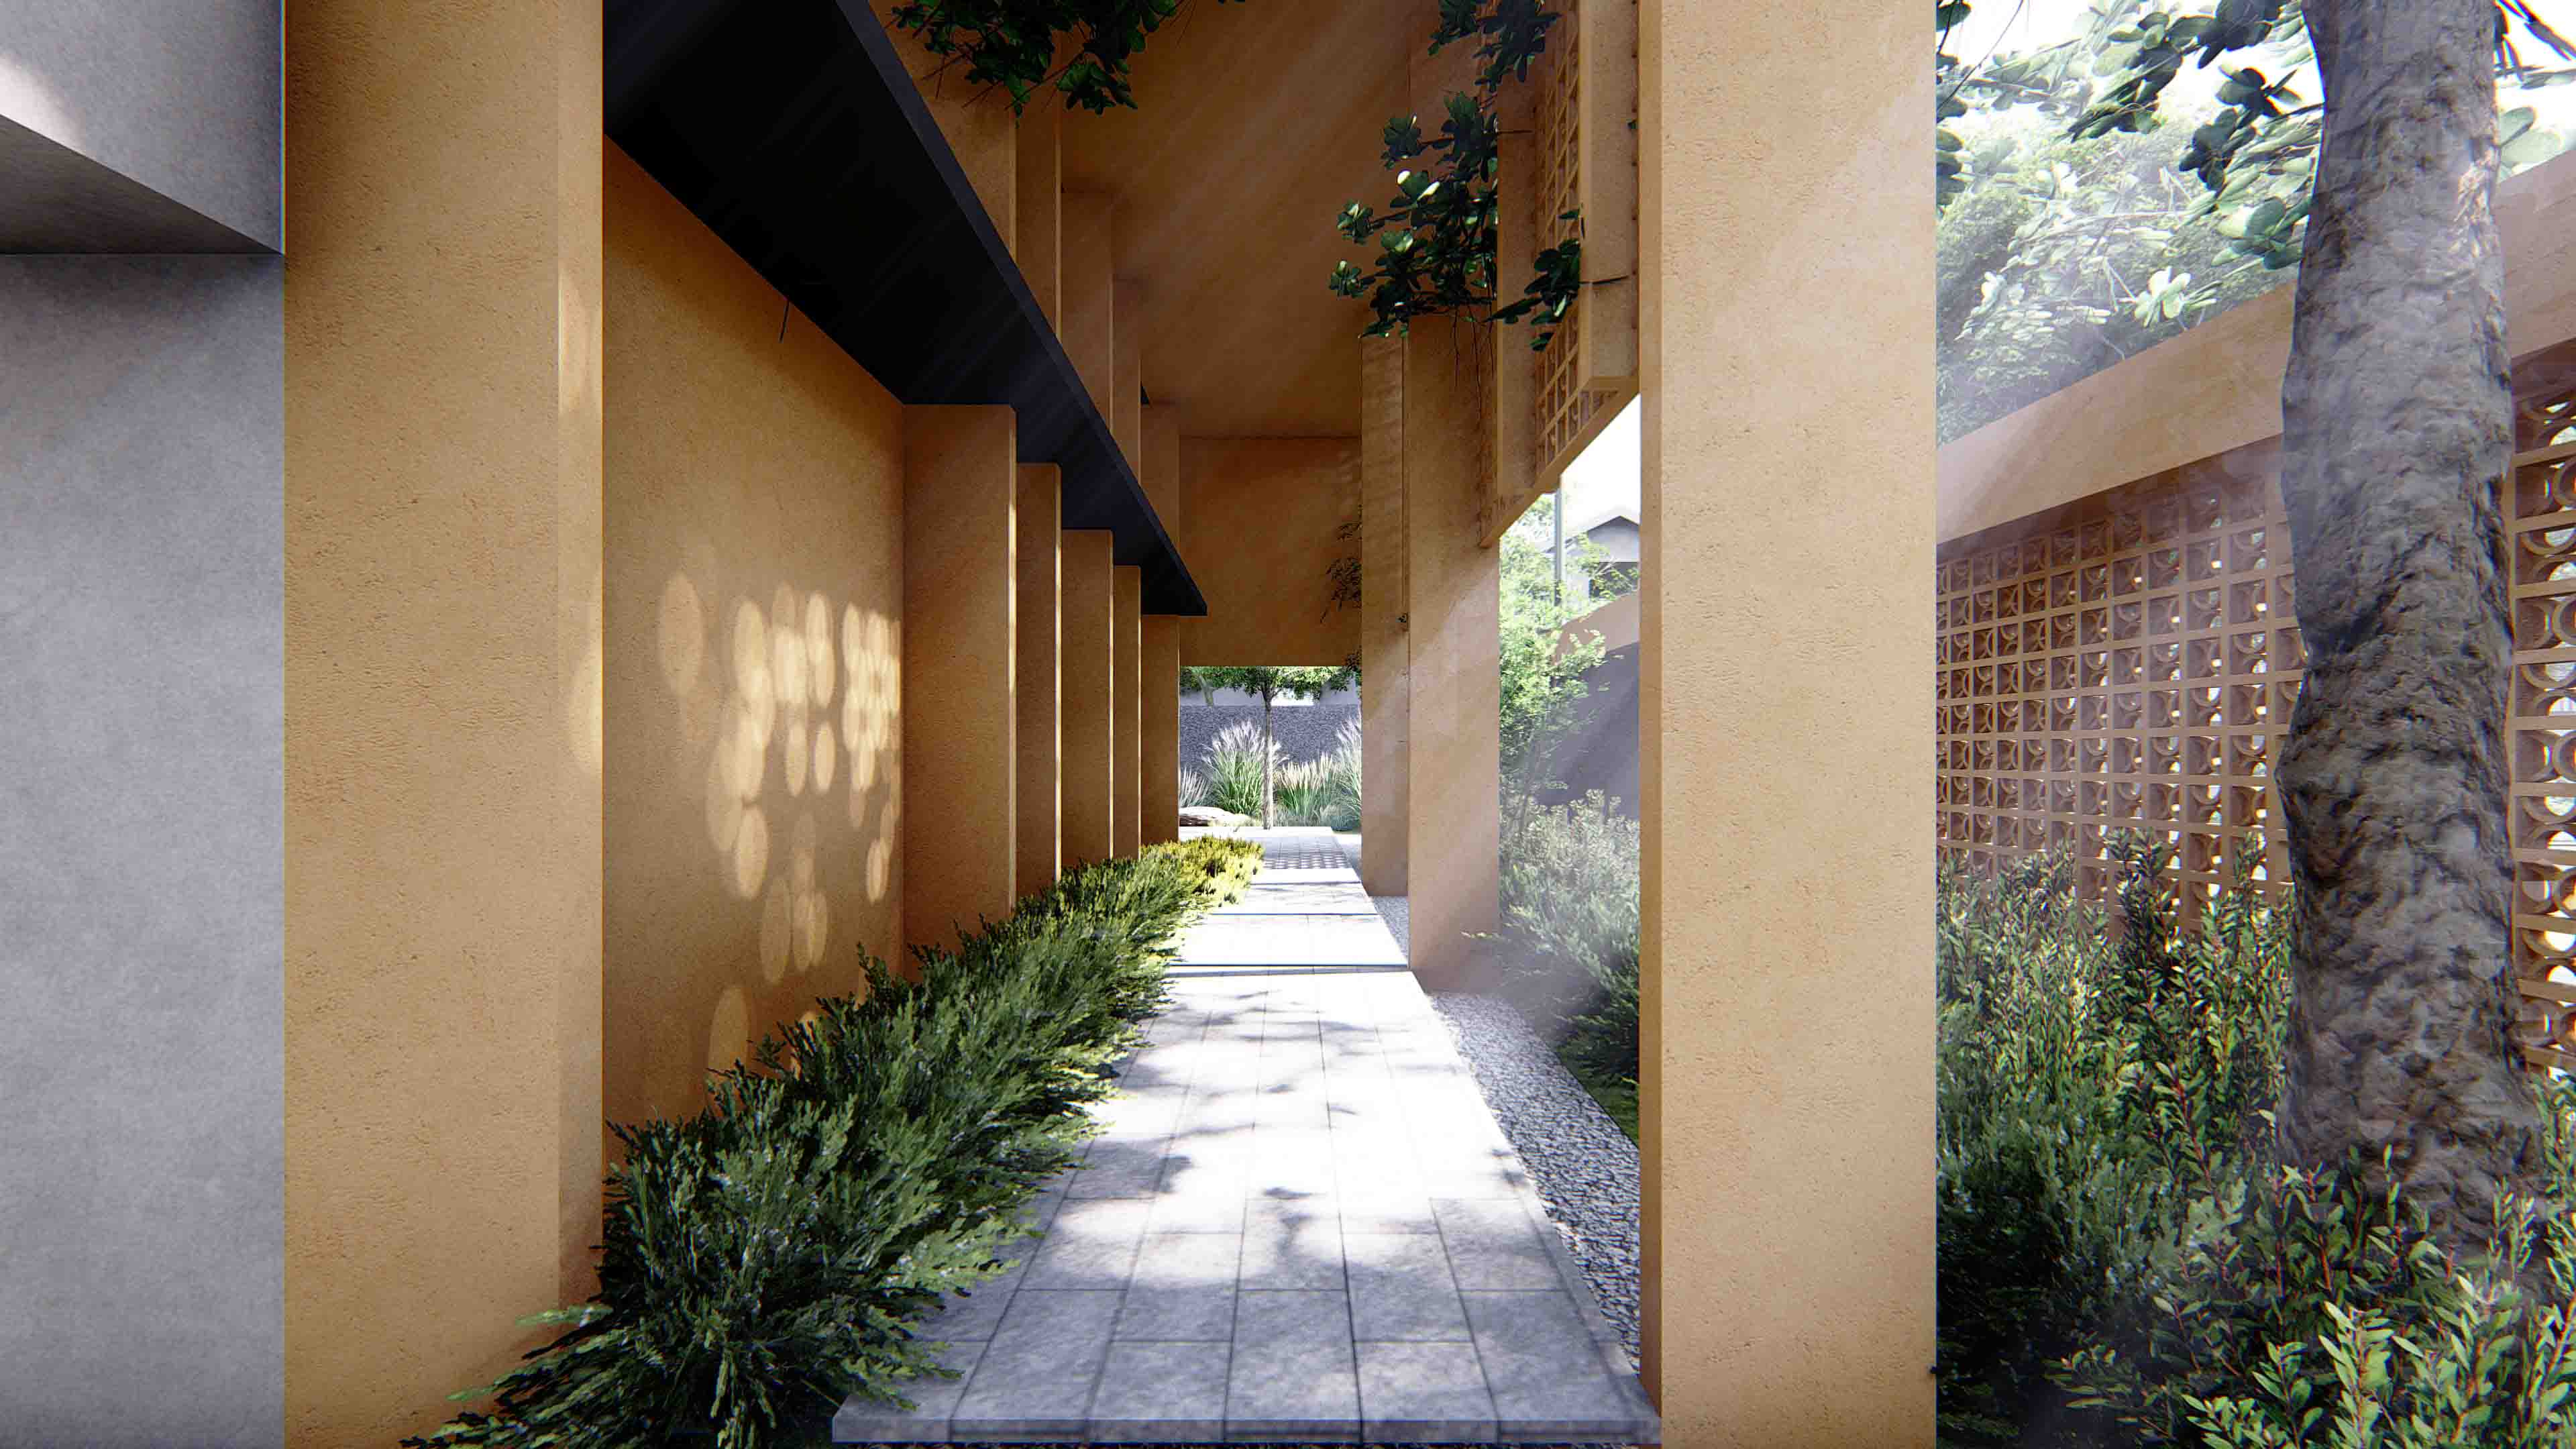 ben House 2 - Image 4